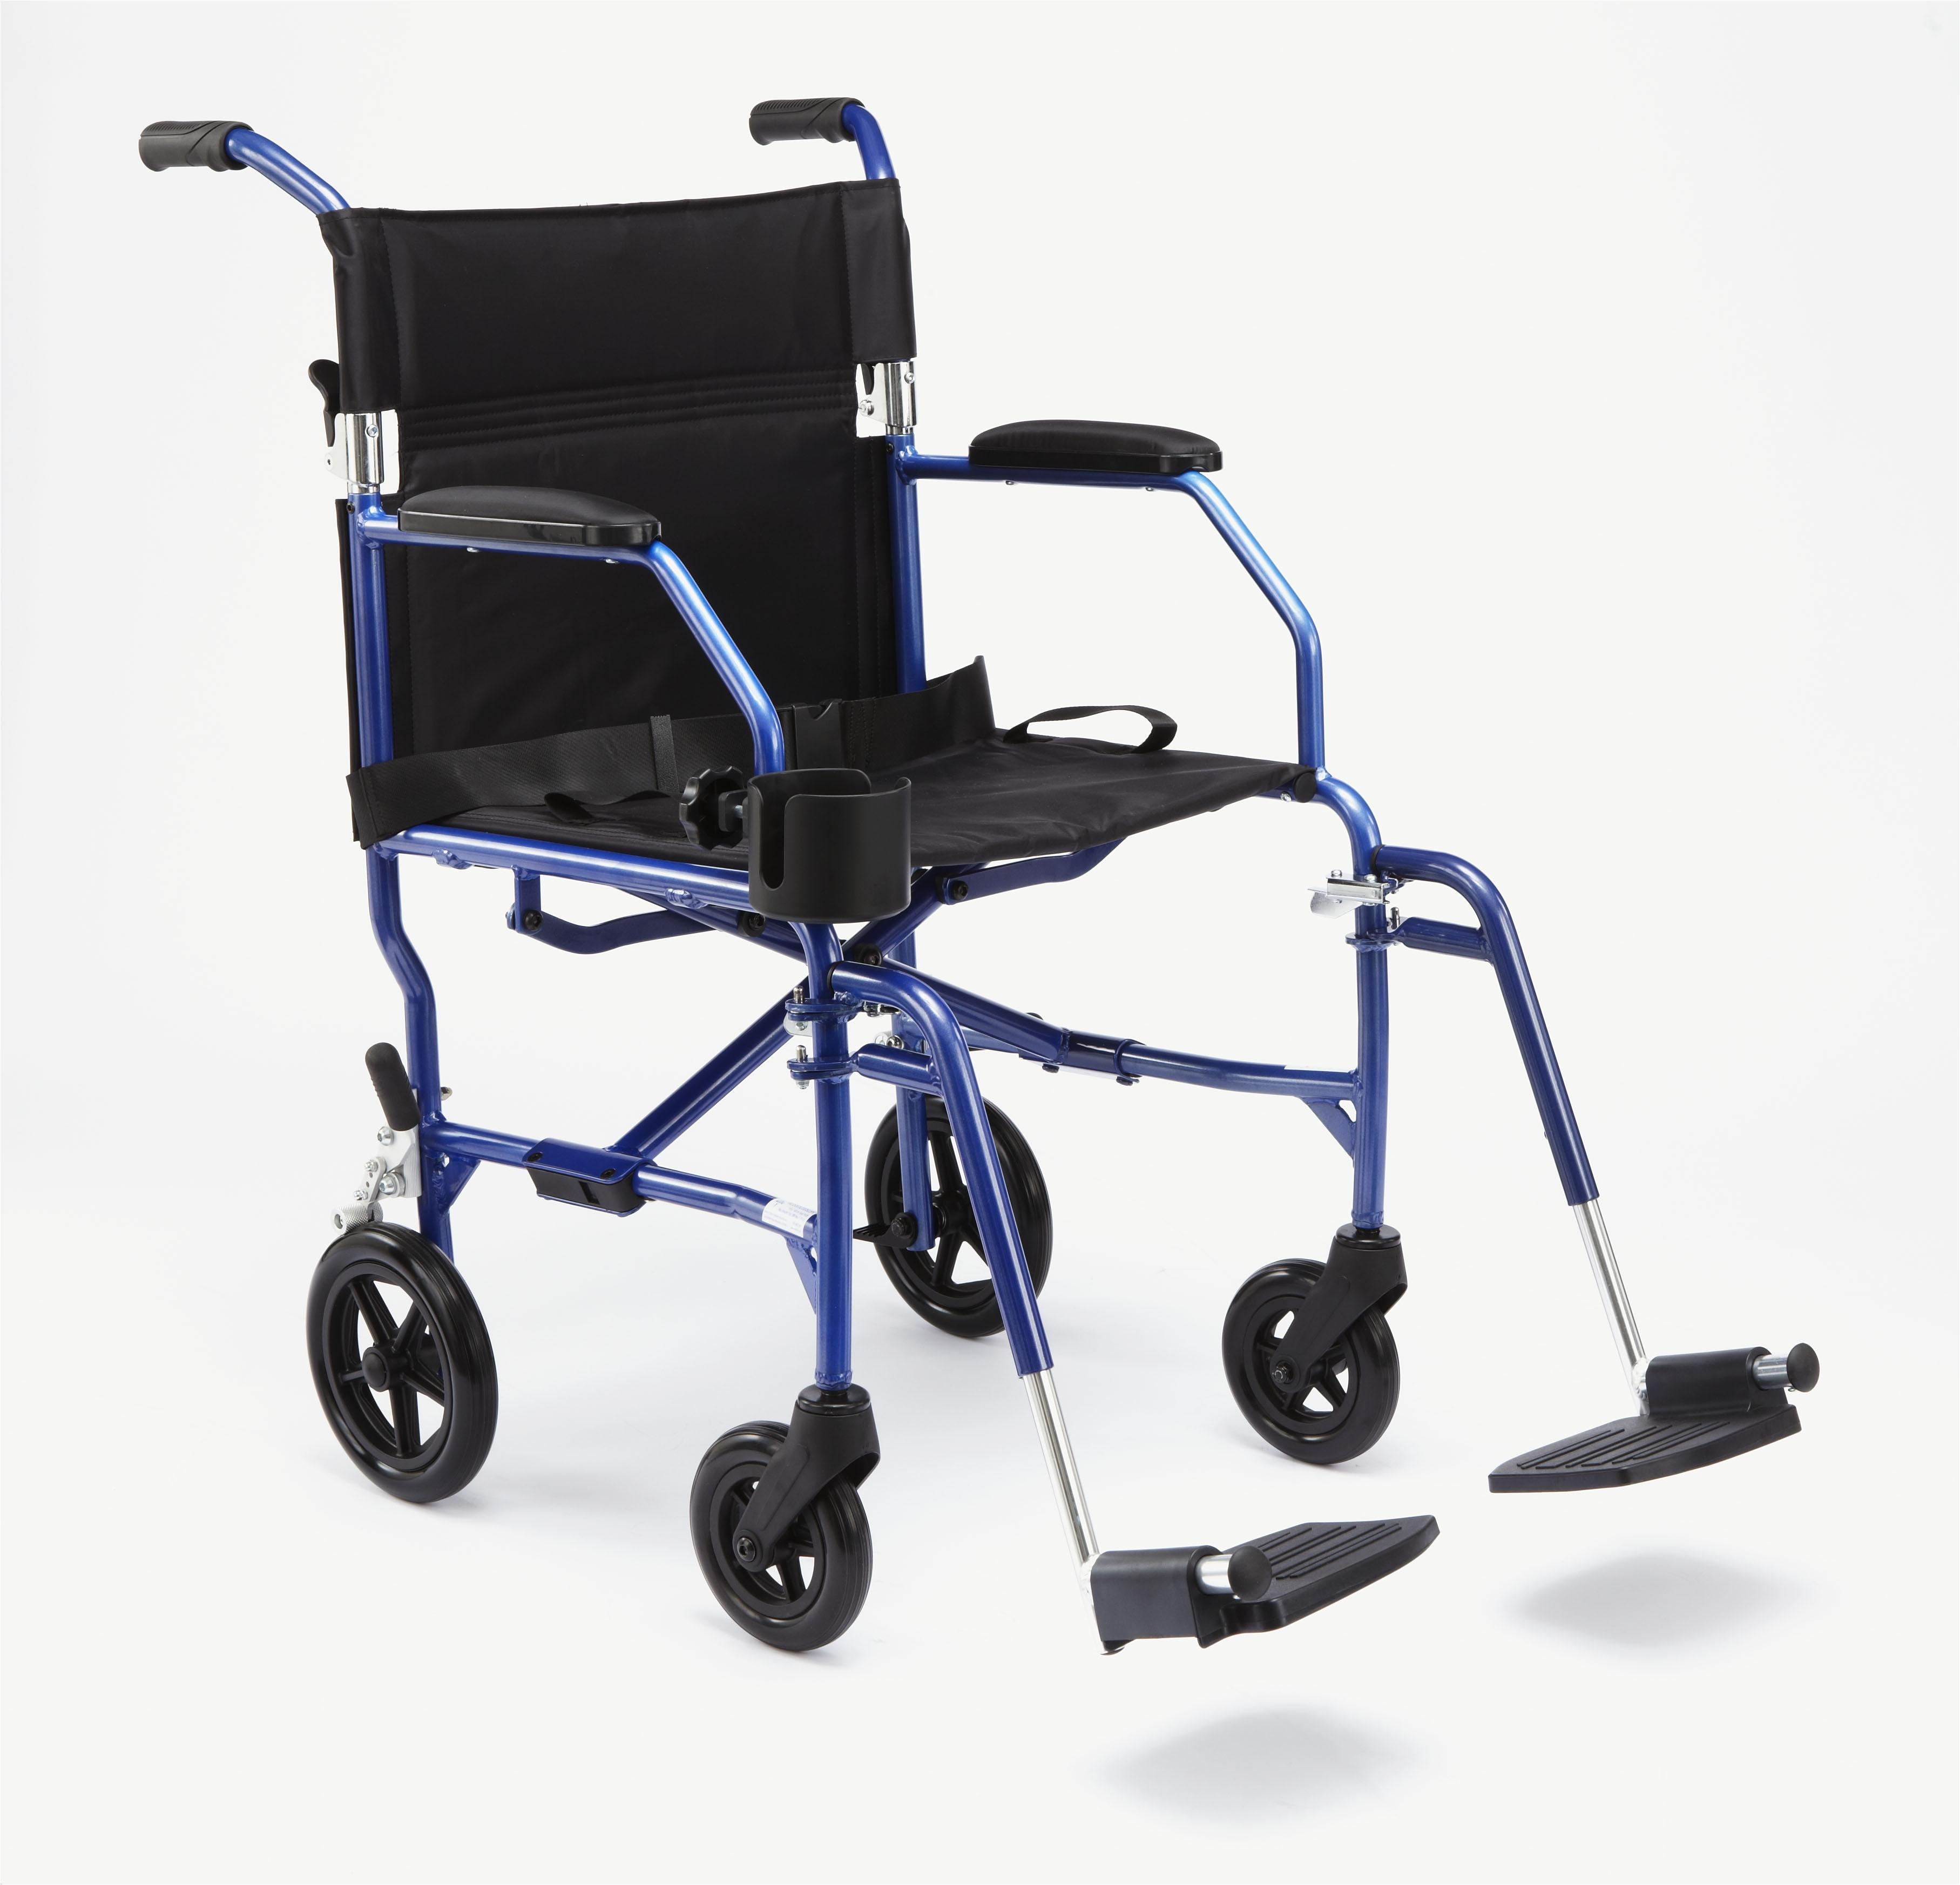 Walmart Steel Transport Chair Chair Hugo Manufacturers Transportation for Wheelchair Invacare